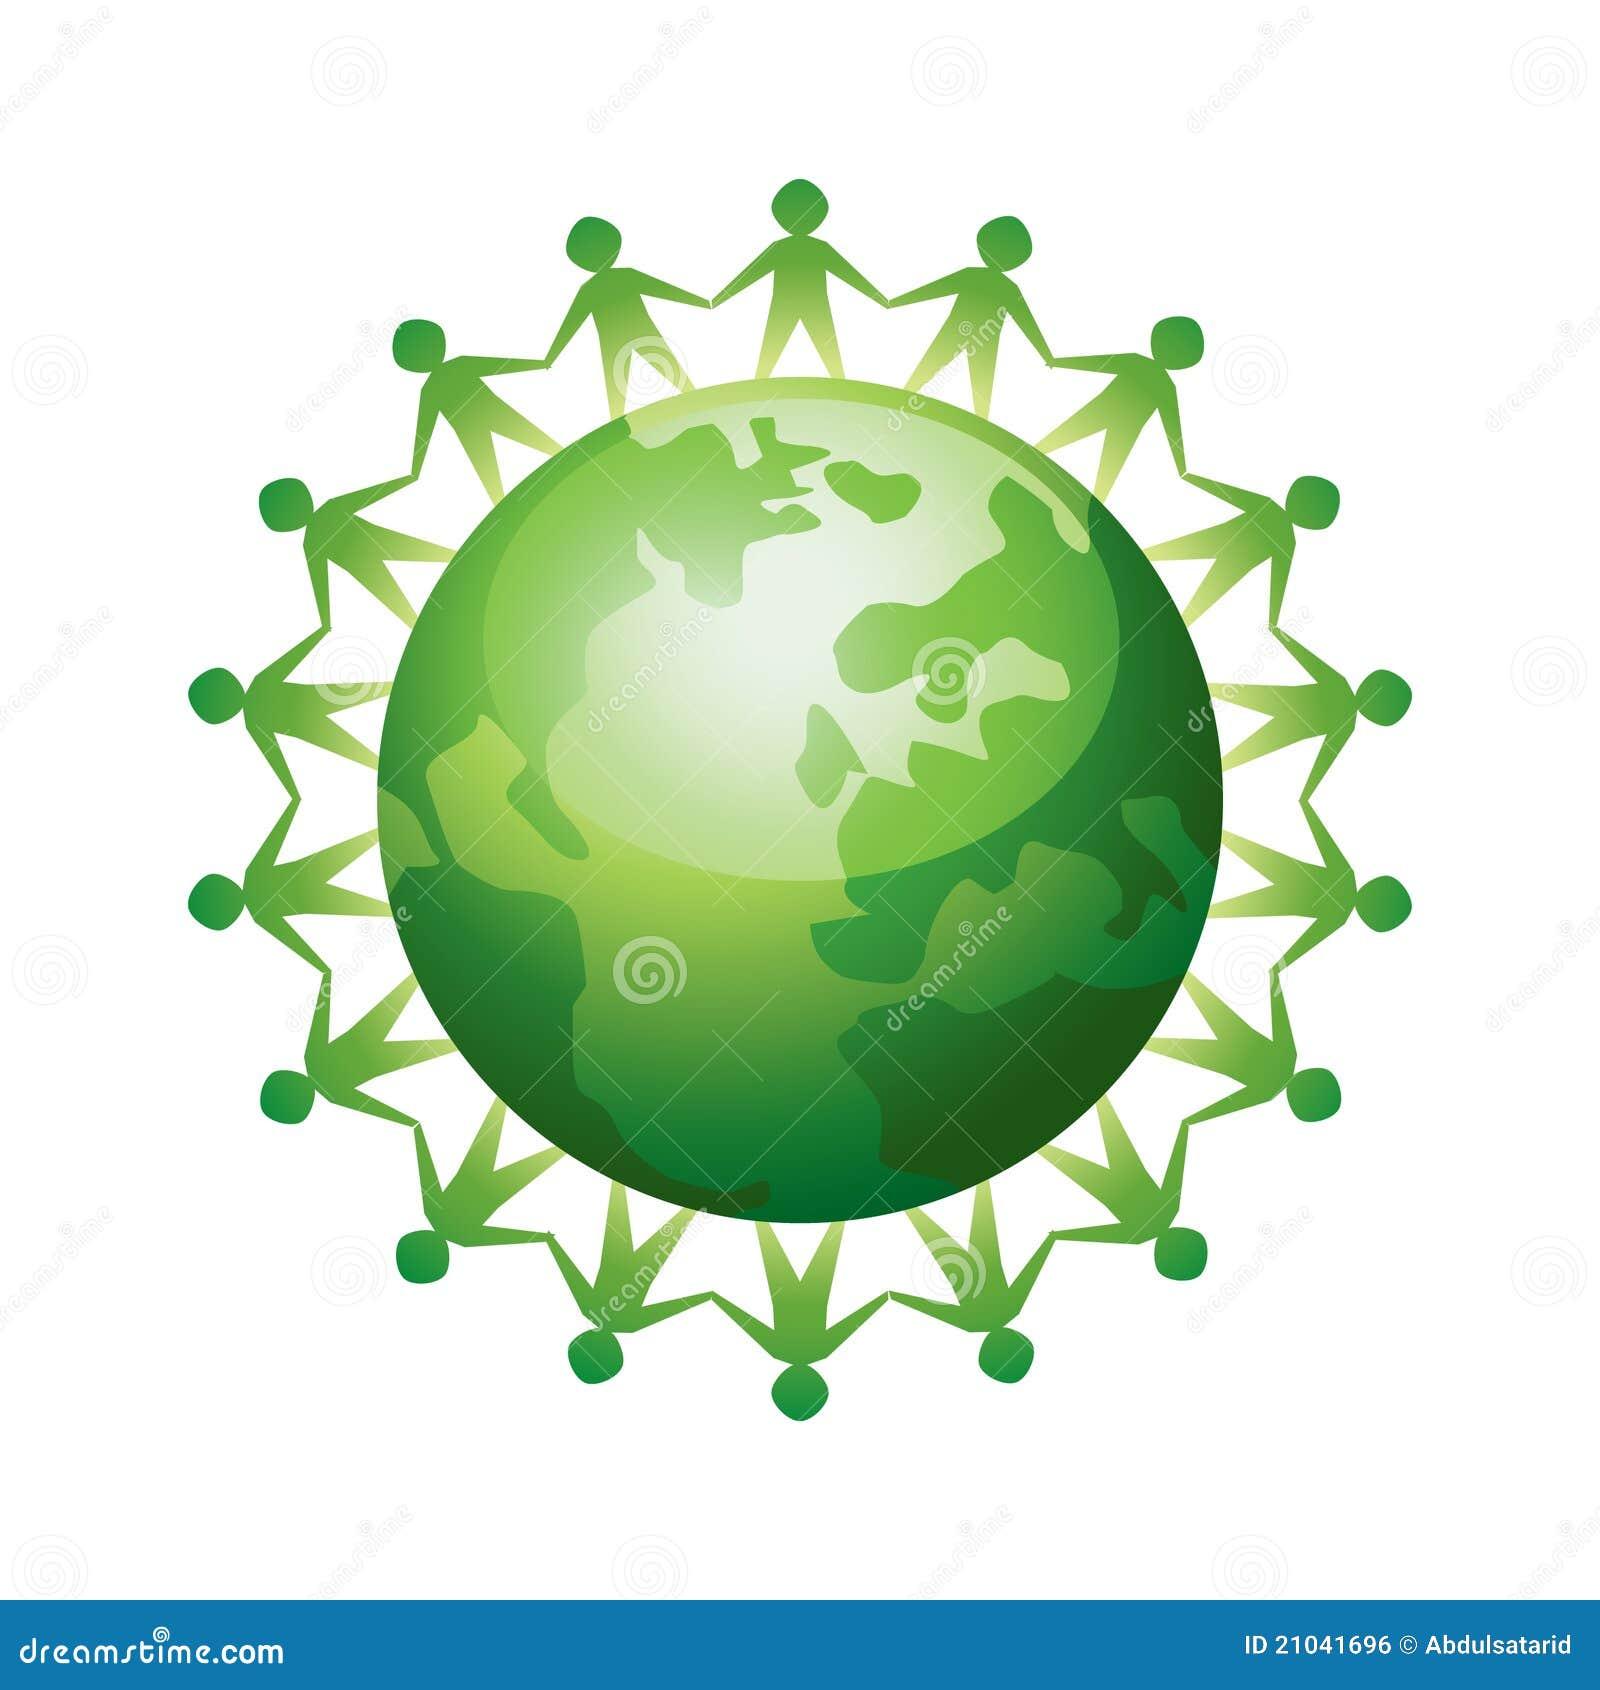 united people around the world royalty free stock image